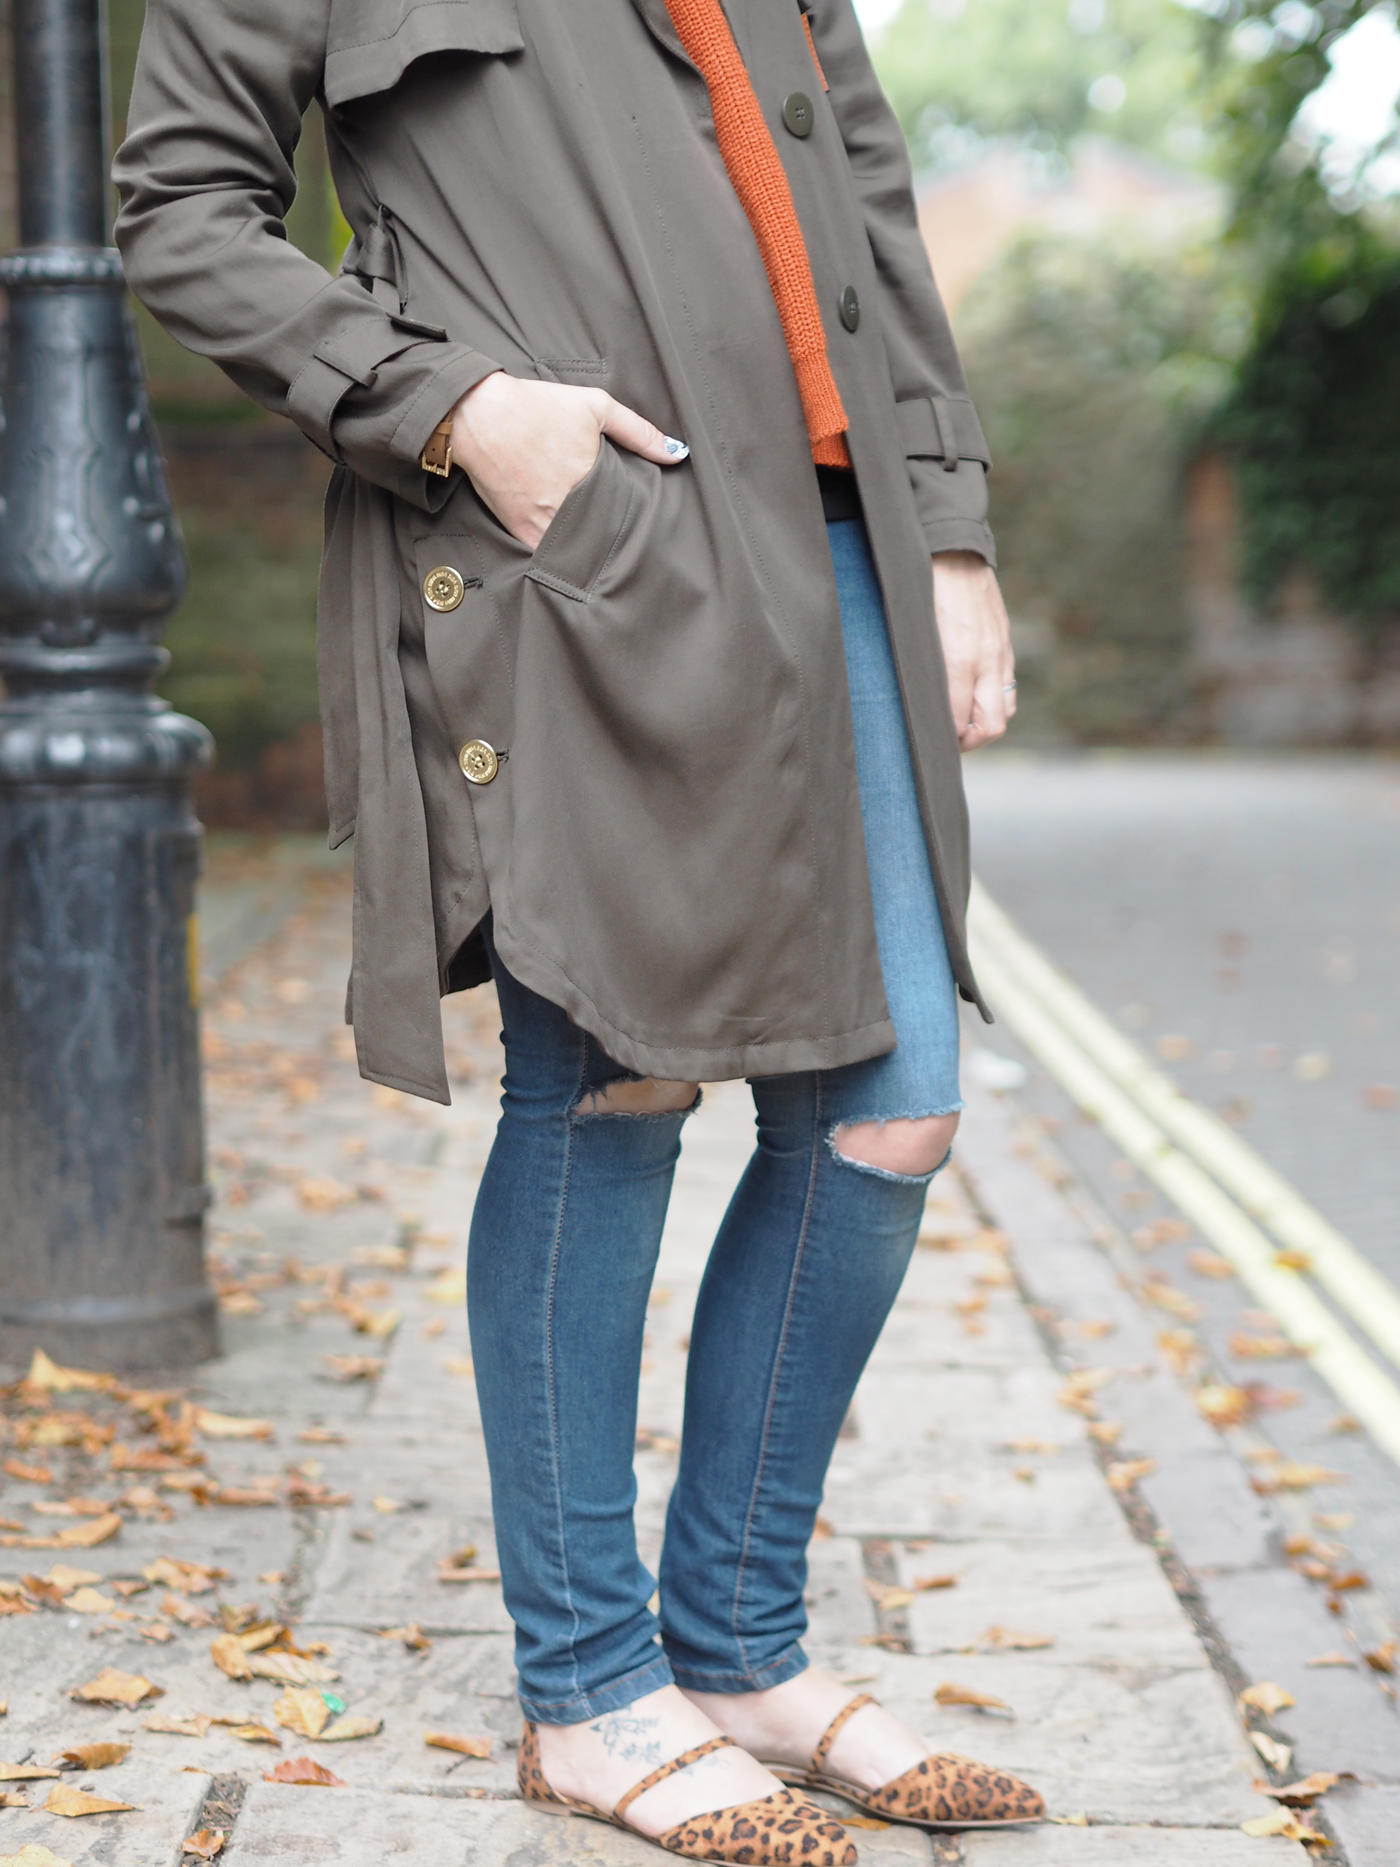 biba trench coat